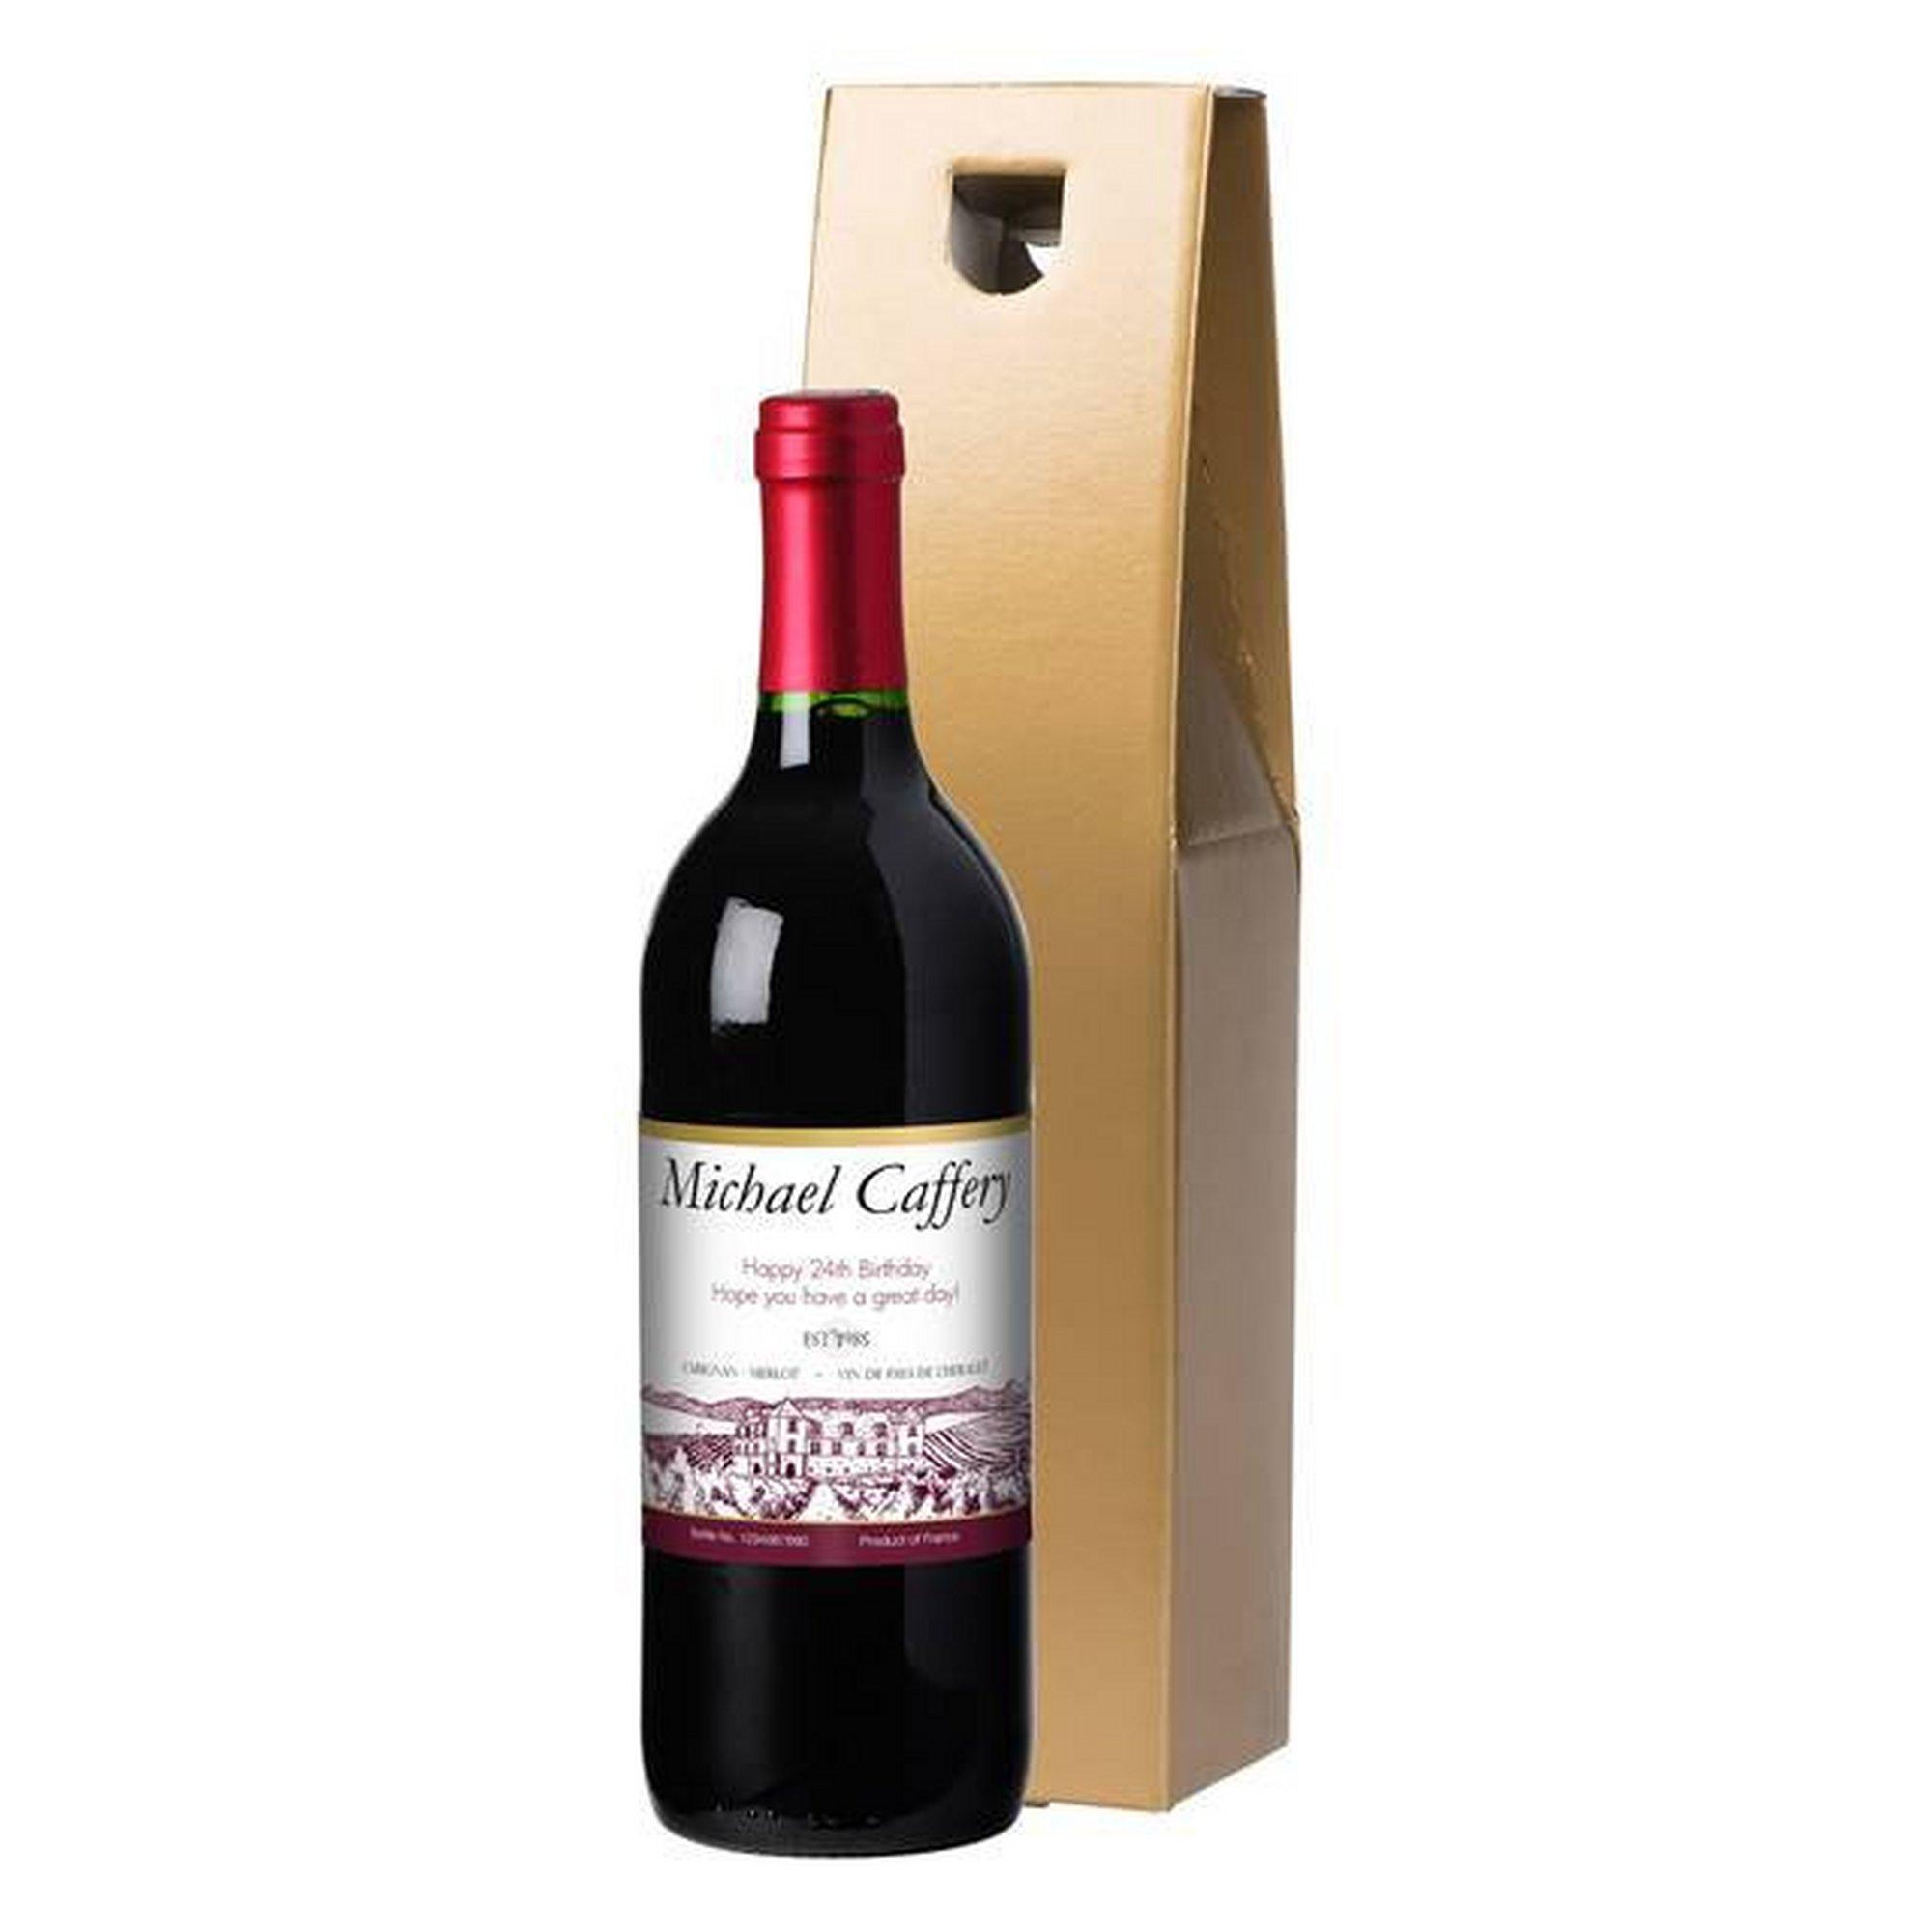 Image of Personalised Bottle of Vineyard Label Red Wine